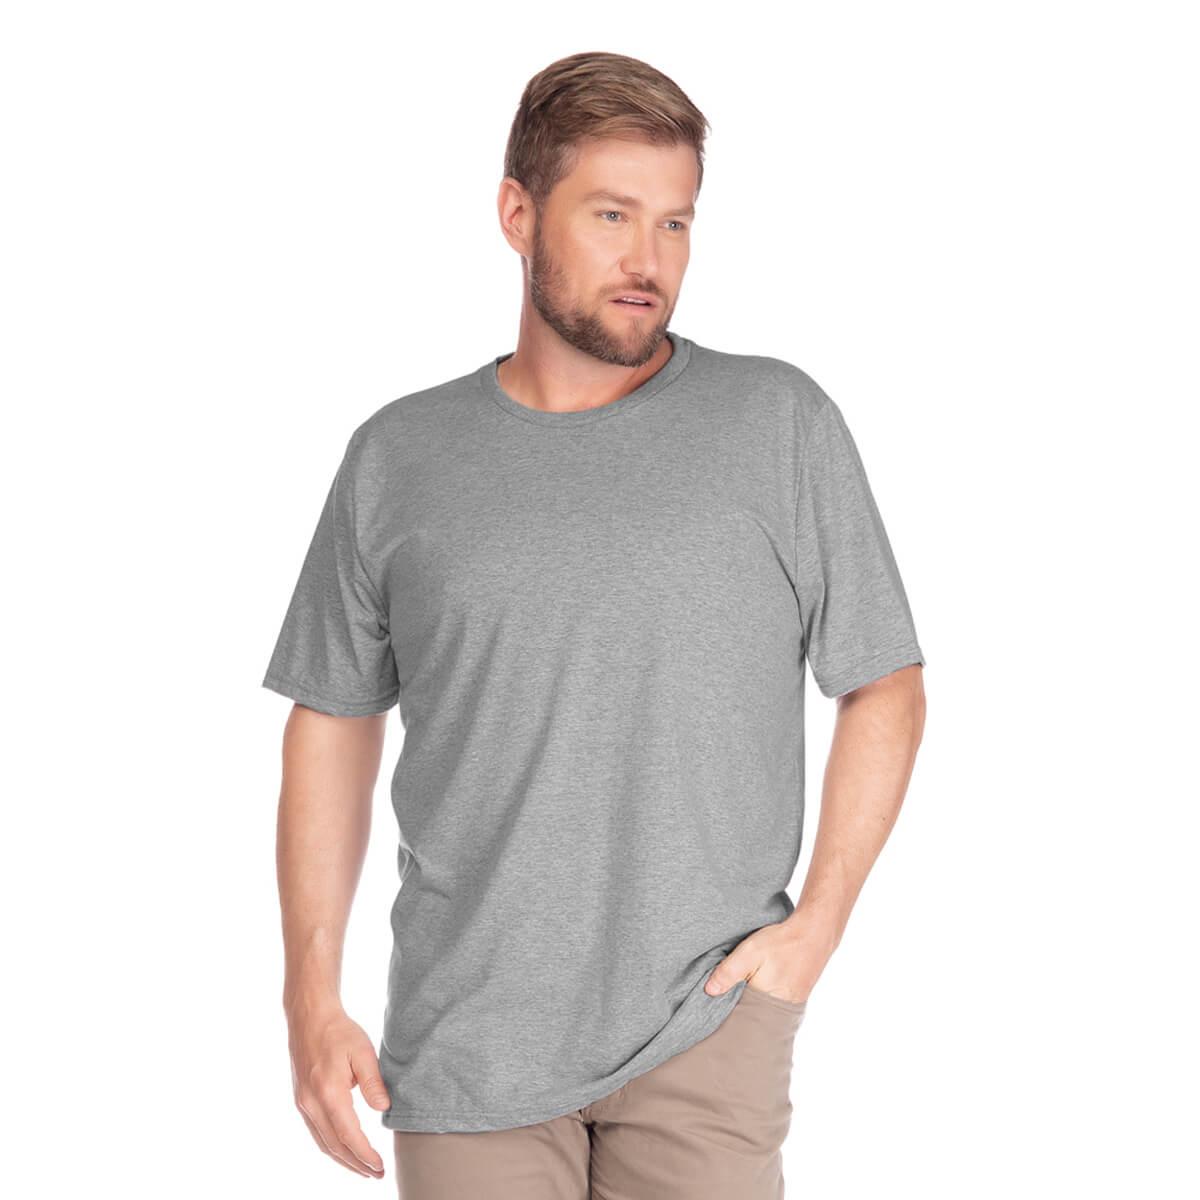 Camiseta Masculina Básica Plus Size Comfort Cinza